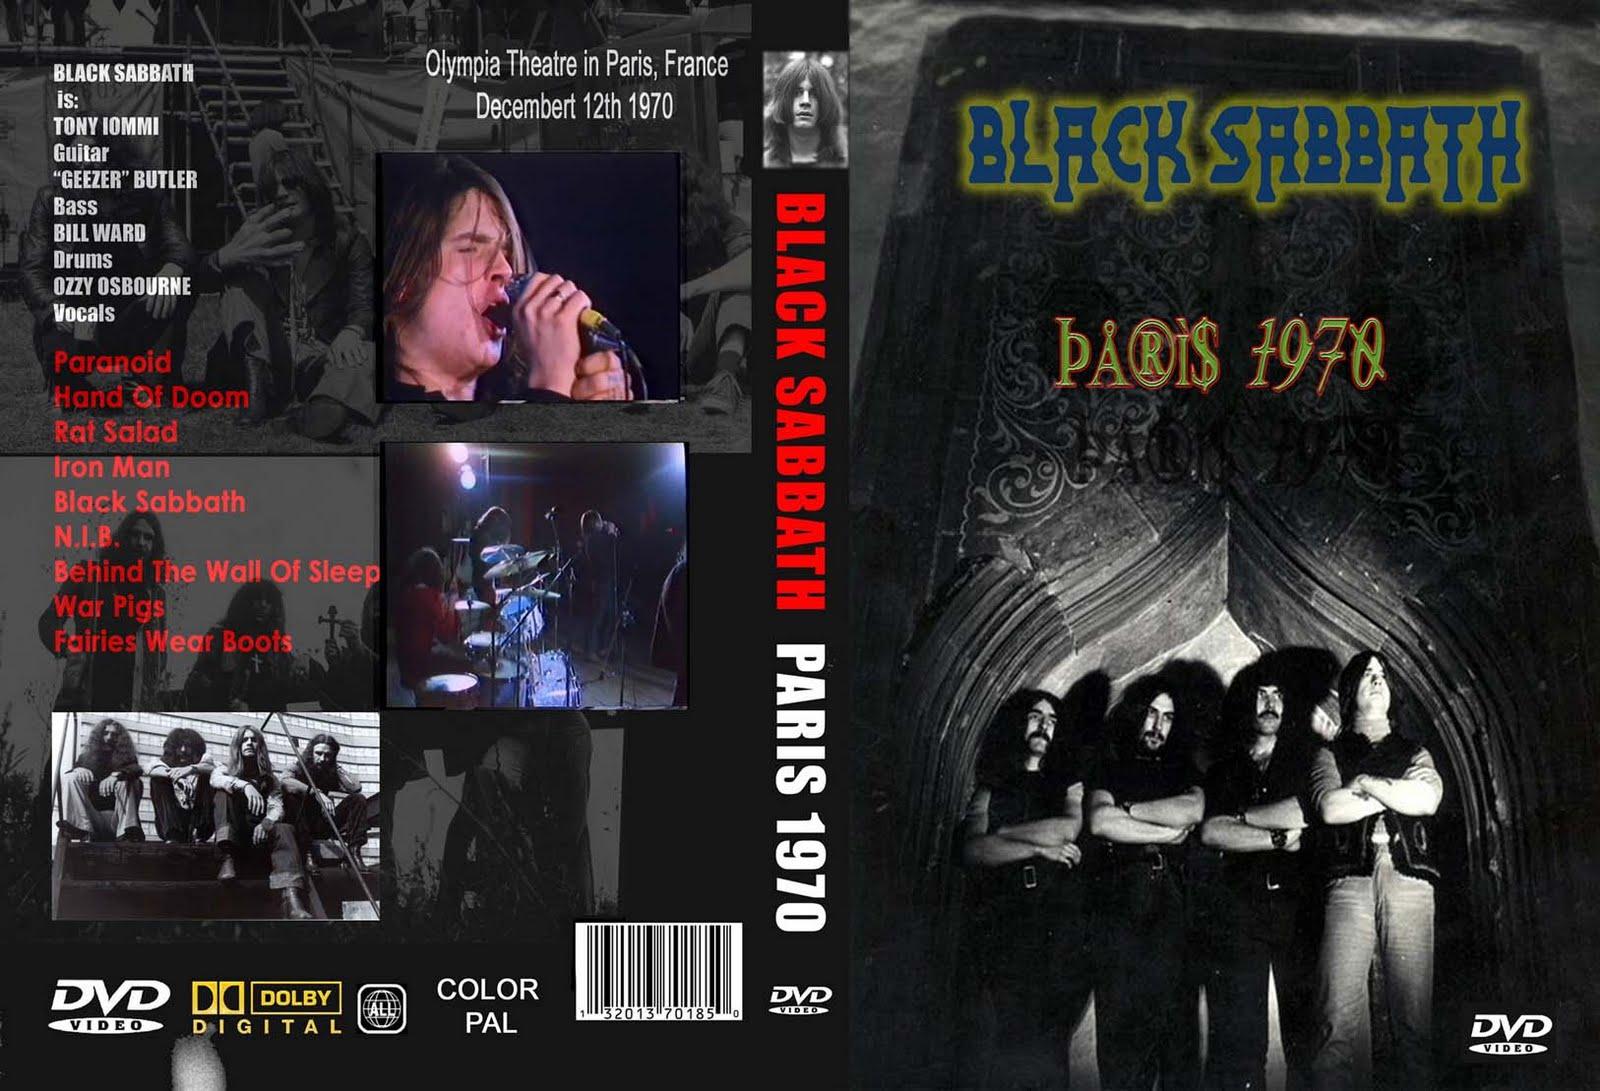 http://1.bp.blogspot.com/-eRDg1v-ipHw/TmDZx3suDuI/AAAAAAAADhQ/dird6cWG7lA/s1600/DVD+Cover+Low+Quality+-+BlackSabbath_1970-12-19_ParisFrance.jpg